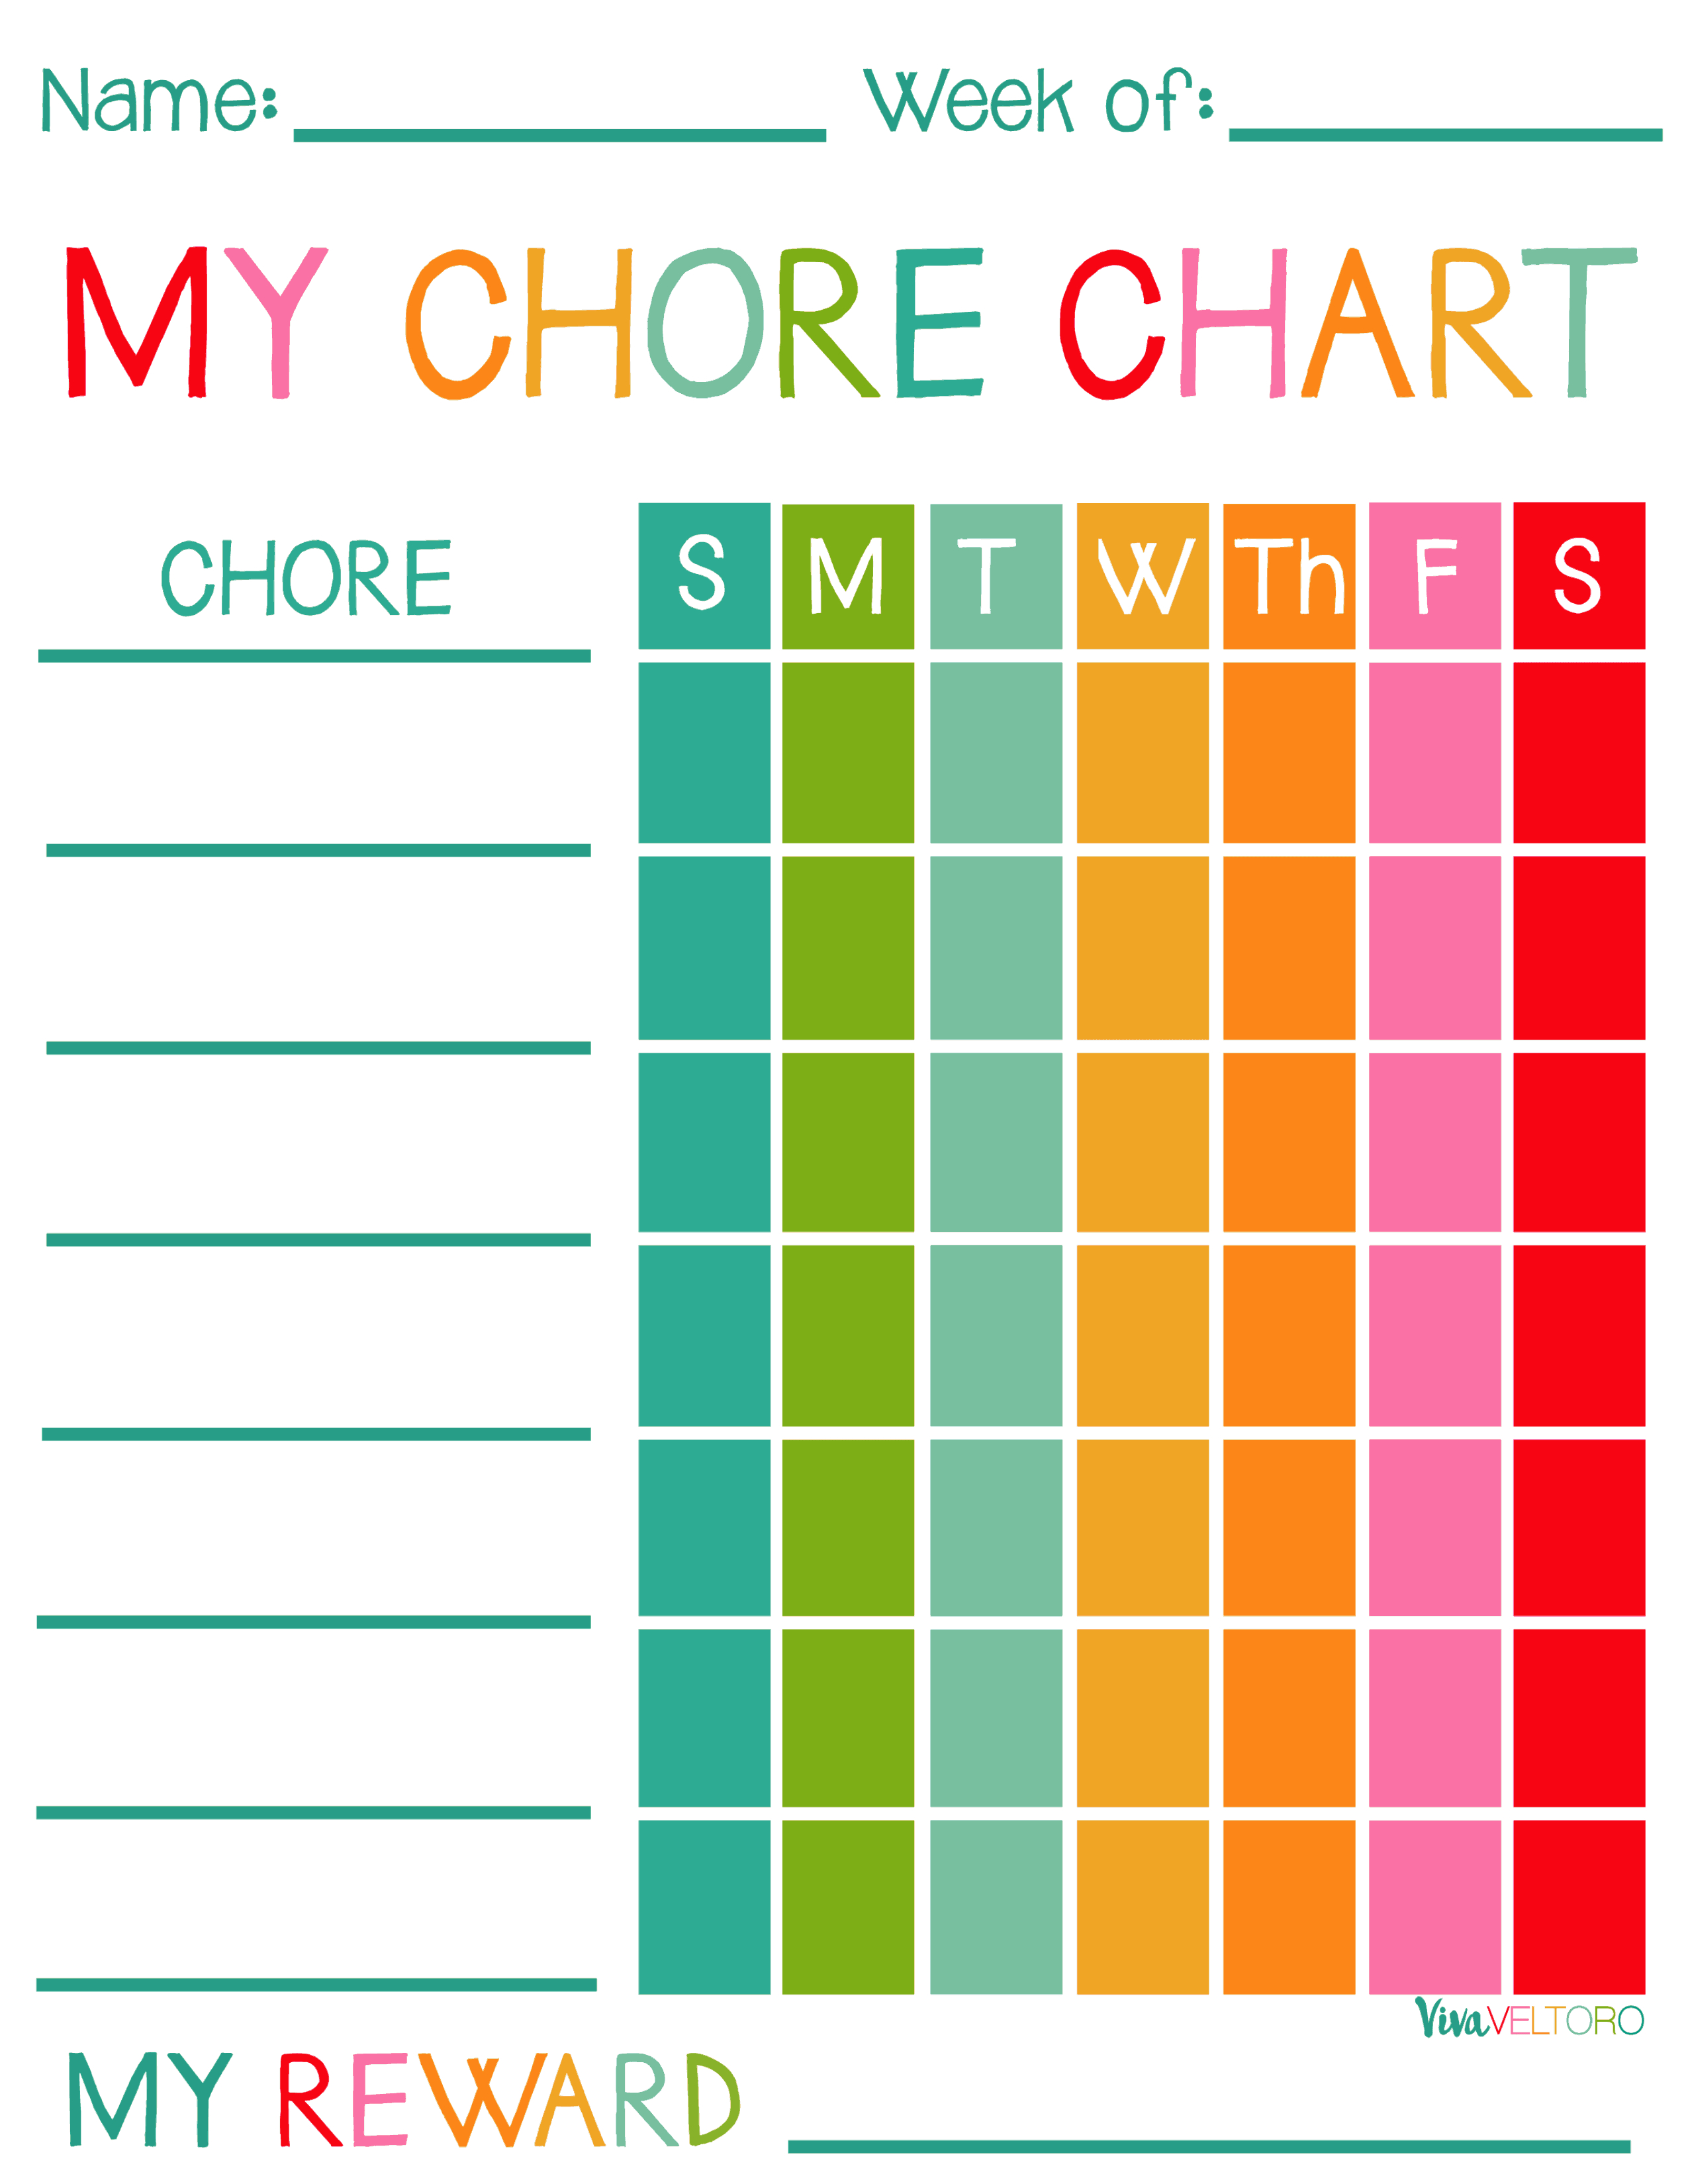 Free Printable Chore Charts For Kids! - Viva Veltoro - Free Printable Chore Charts For Kids With Pictures